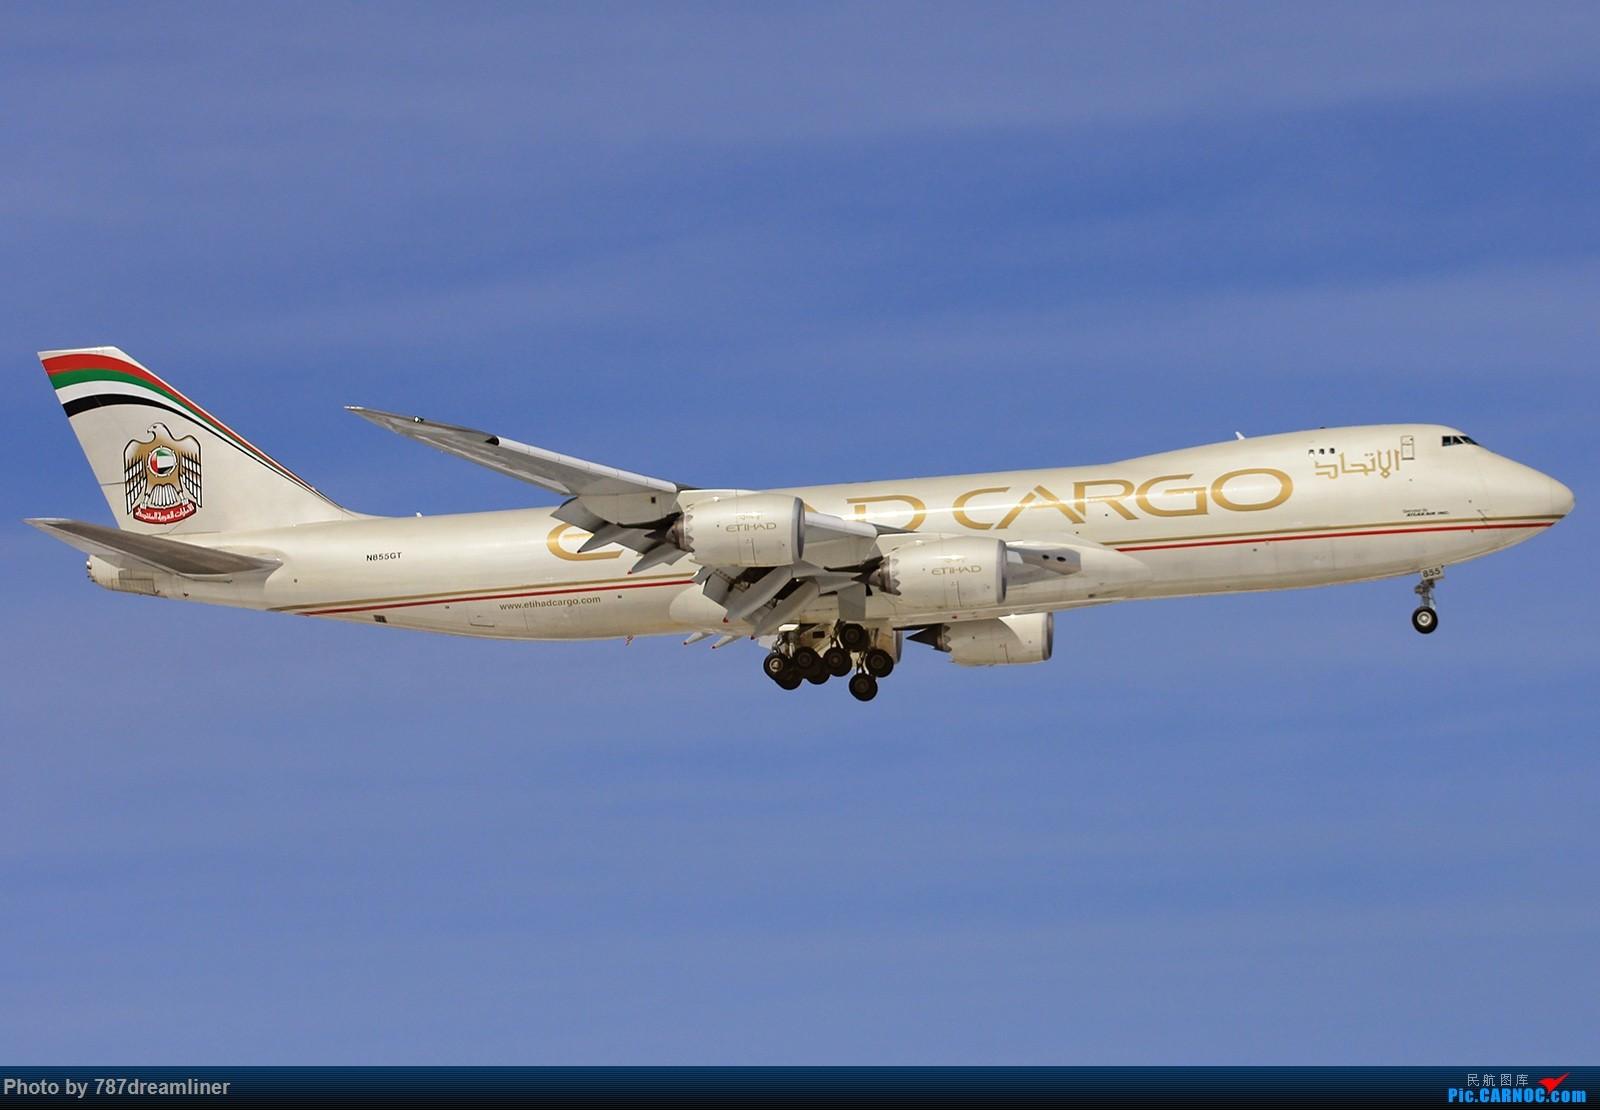 Re:【北美飞友会-ORD】土豪国的土豪金—伊蒂哈德Cargo Boeing 747-87UF N855GT 芝加哥跑道10降落 BOEING 747-8F N855GT 美国芝加哥奥黑尔国际机场